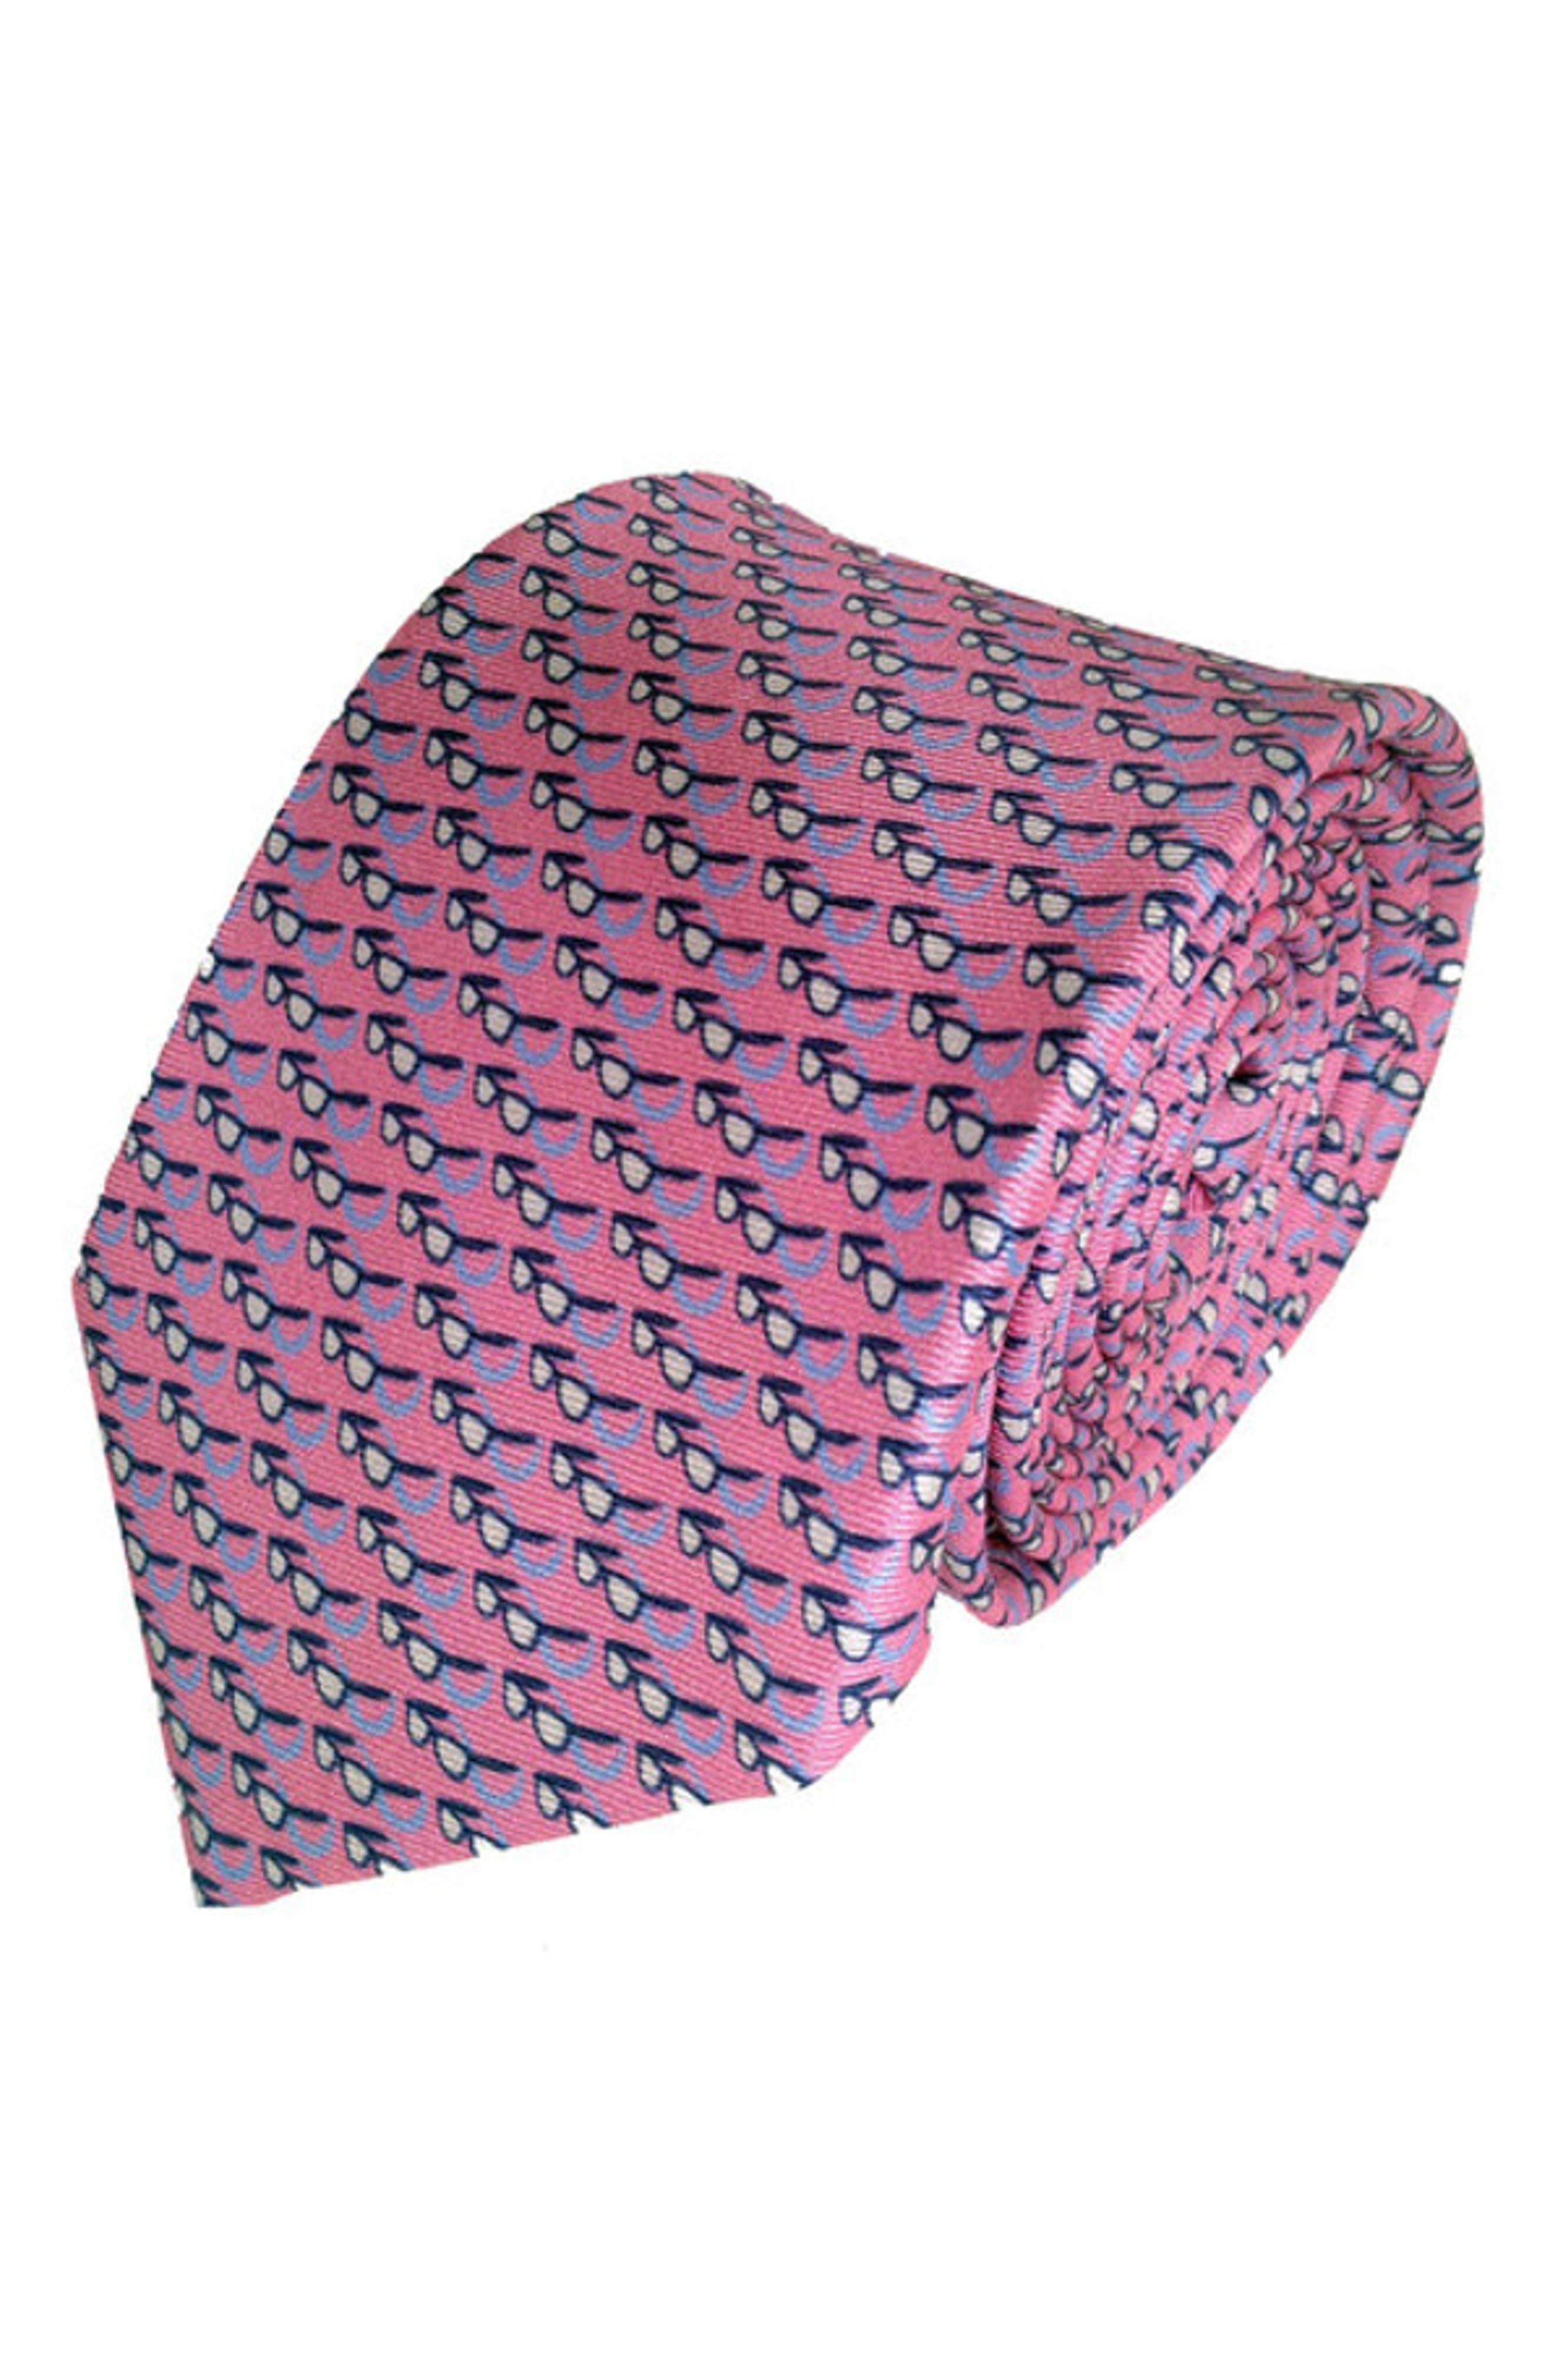 Sweet Shades Silk Tie,                             Main thumbnail 1, color,                             650